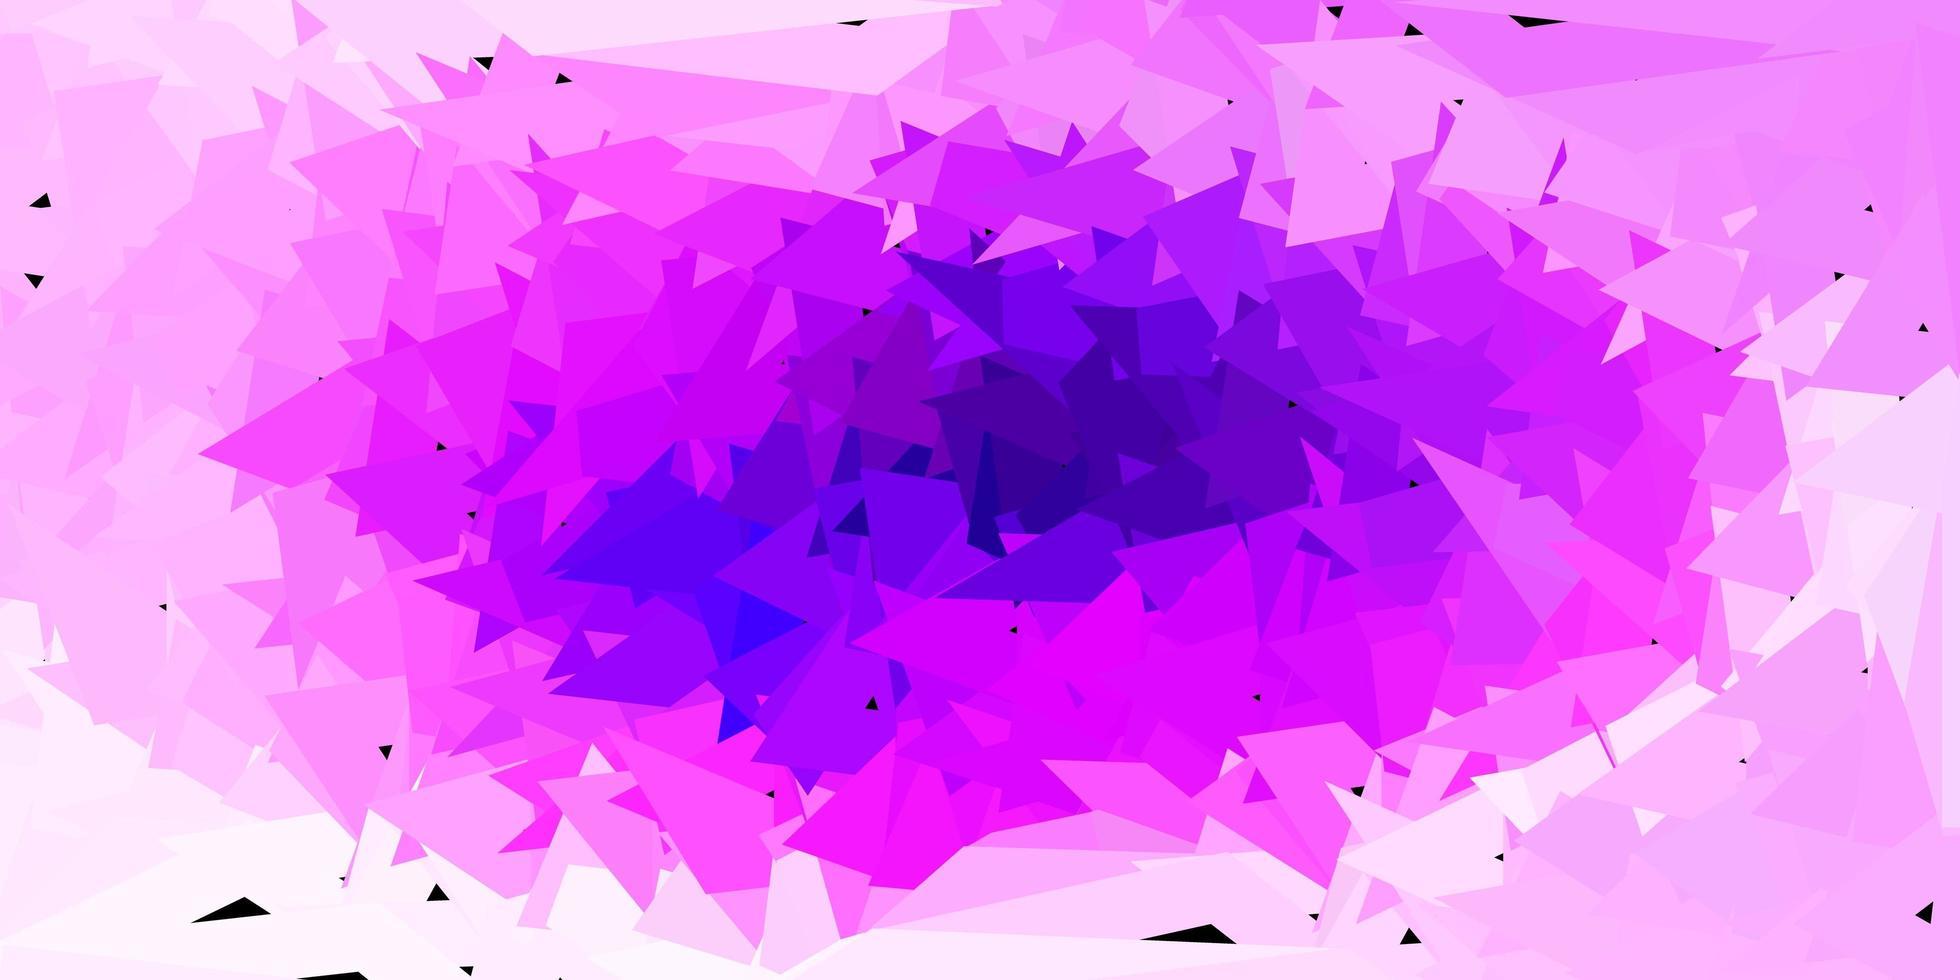 hellviolettes, rosa Vektorgradienten-Polygonlayout. vektor